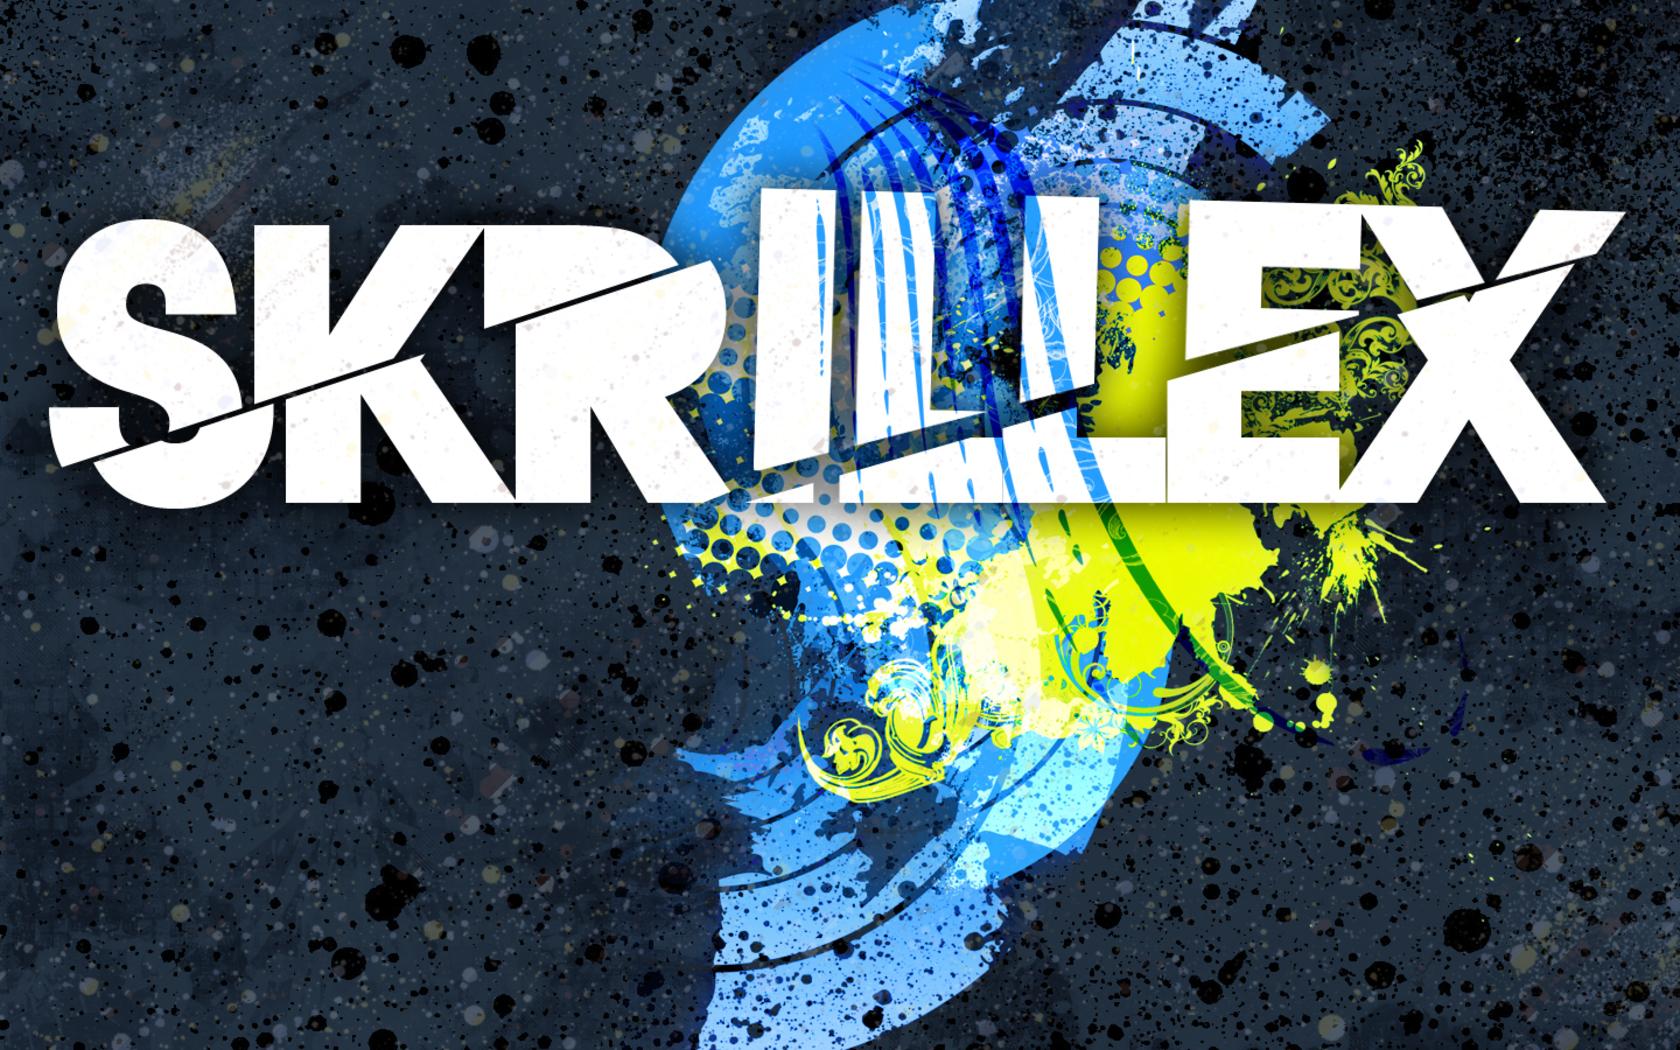 Muzyka - Skrillex  Dubstep Trance Muzyka Tapeta